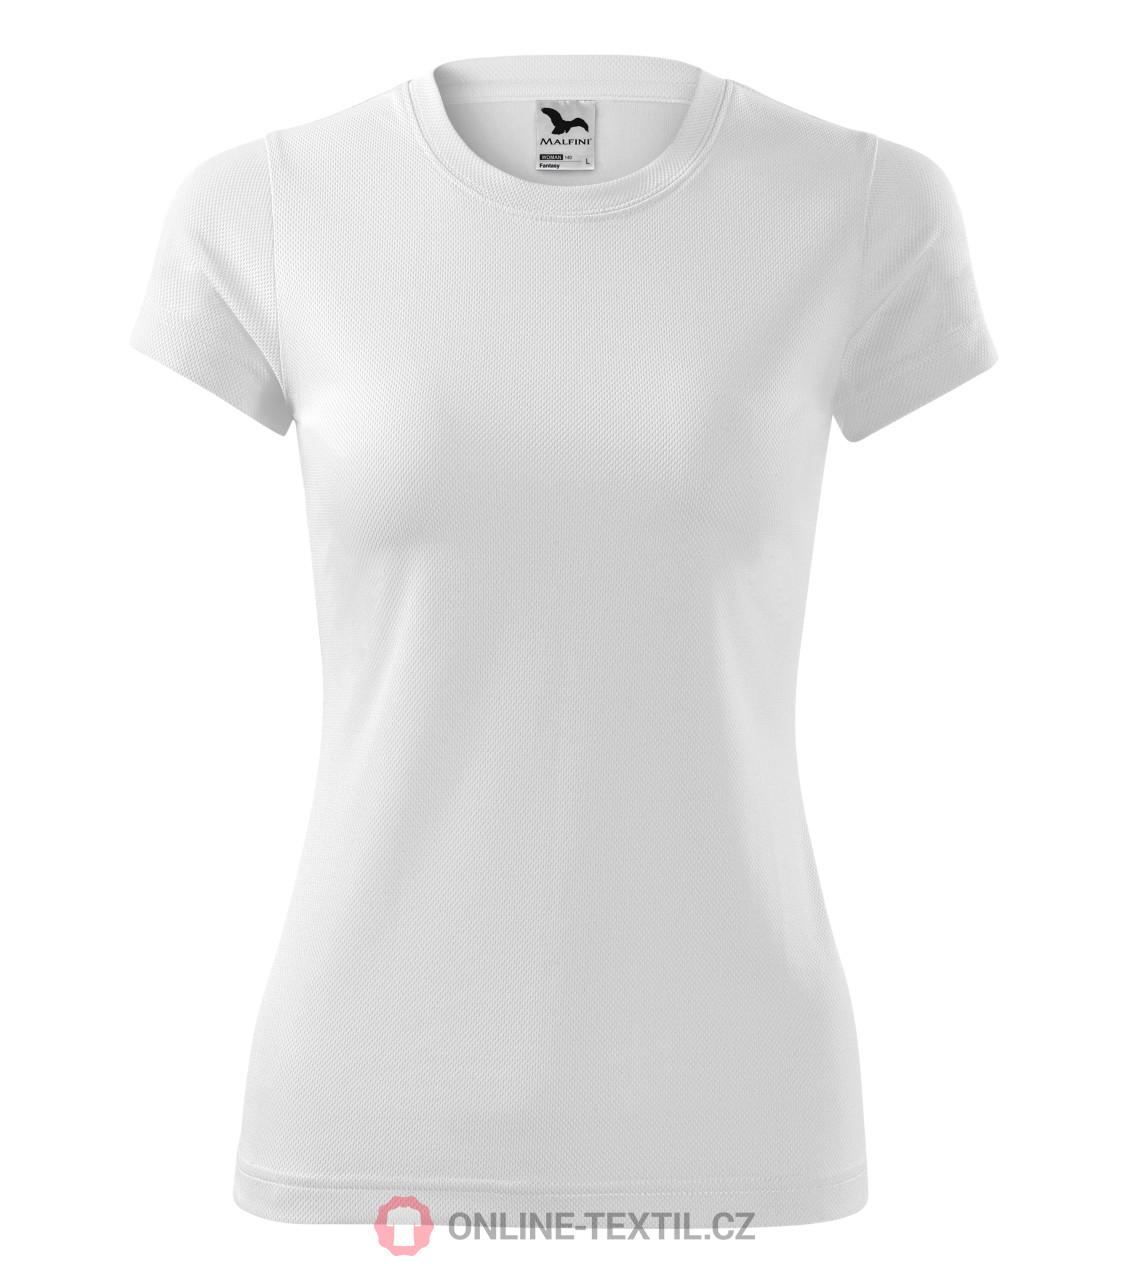 ca17a0dfab88a ADLER CZECH Dámske športové tričko Fantasy 140 - biela z kolekcie ...